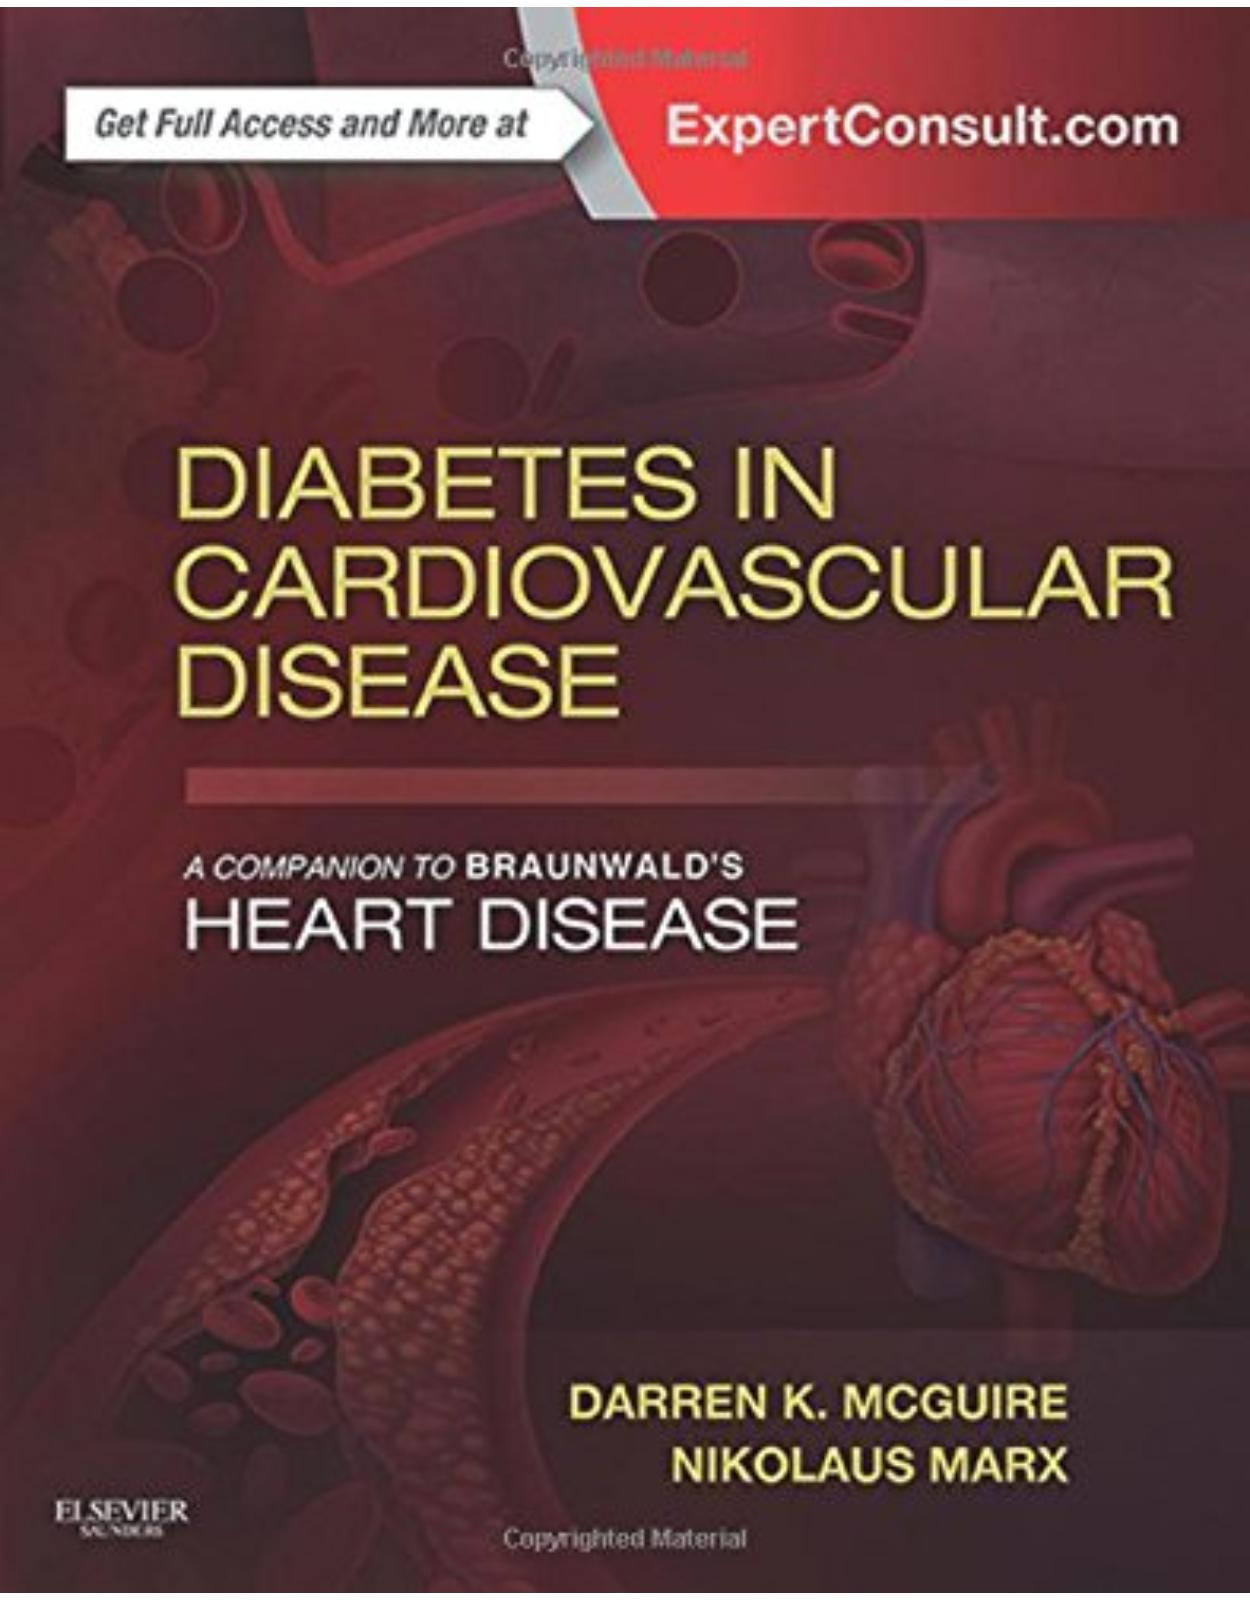 Diabetes in Cardiovascular Disease: A Companion to Braunwald's Heart Disease, 1e